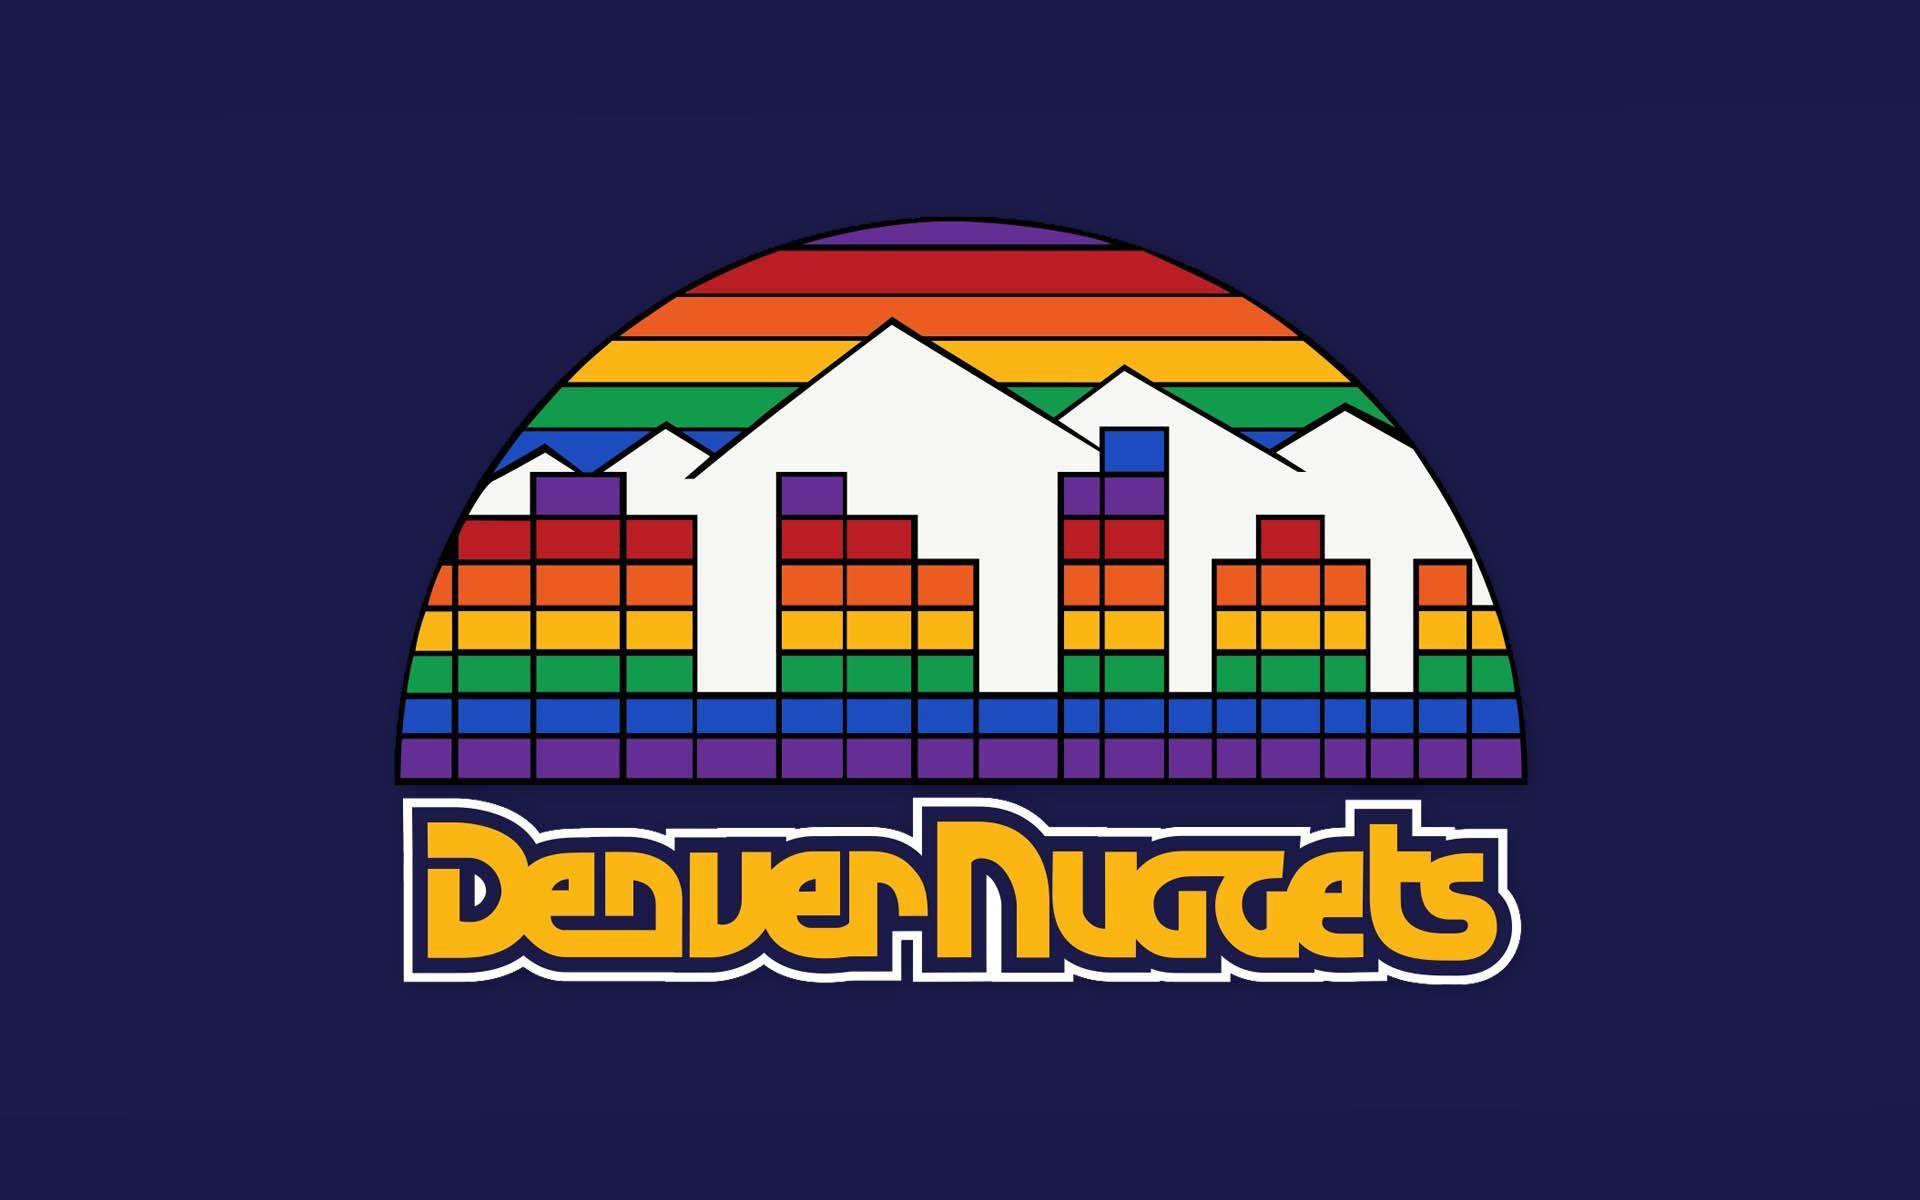 Denver Nuggets Wallpapers HD | PixelsTalk.Net